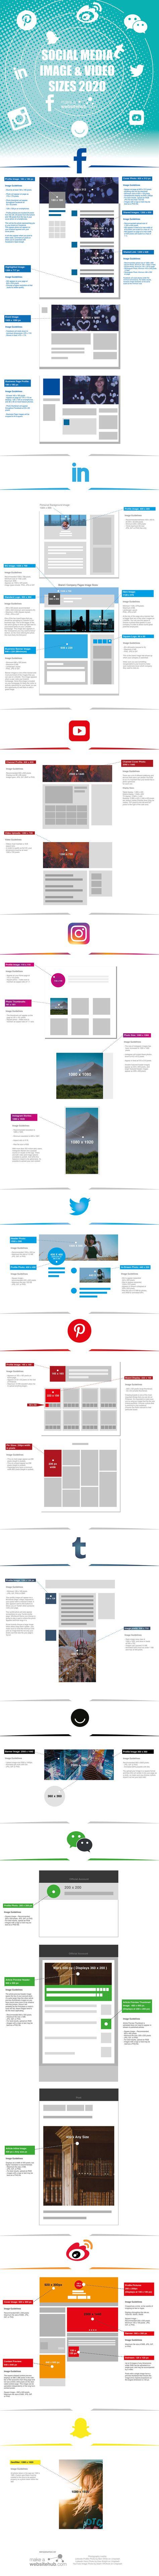 2021 Social Media Image Sizes Cheat Sheet - Make A Website Hub